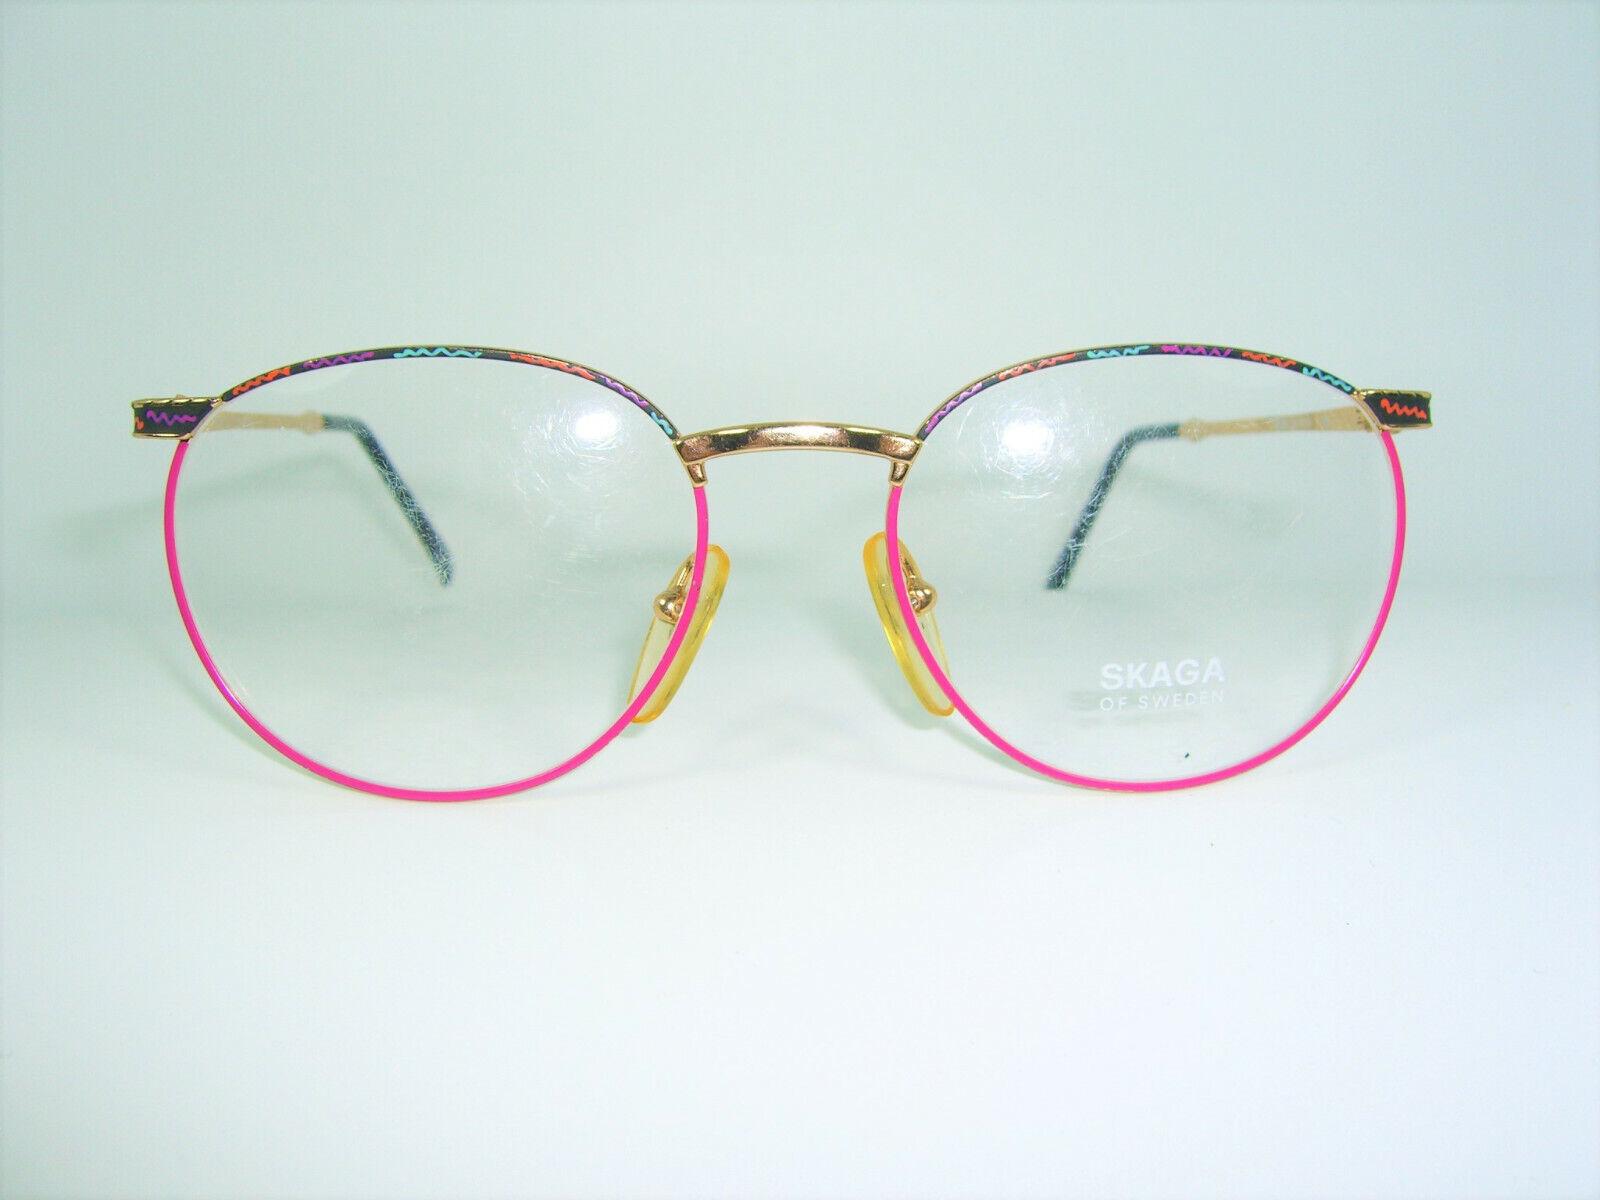 Skaga, eyeglasses, round, Panto, oval, Gold plated, frames, NOS, hyper vintage